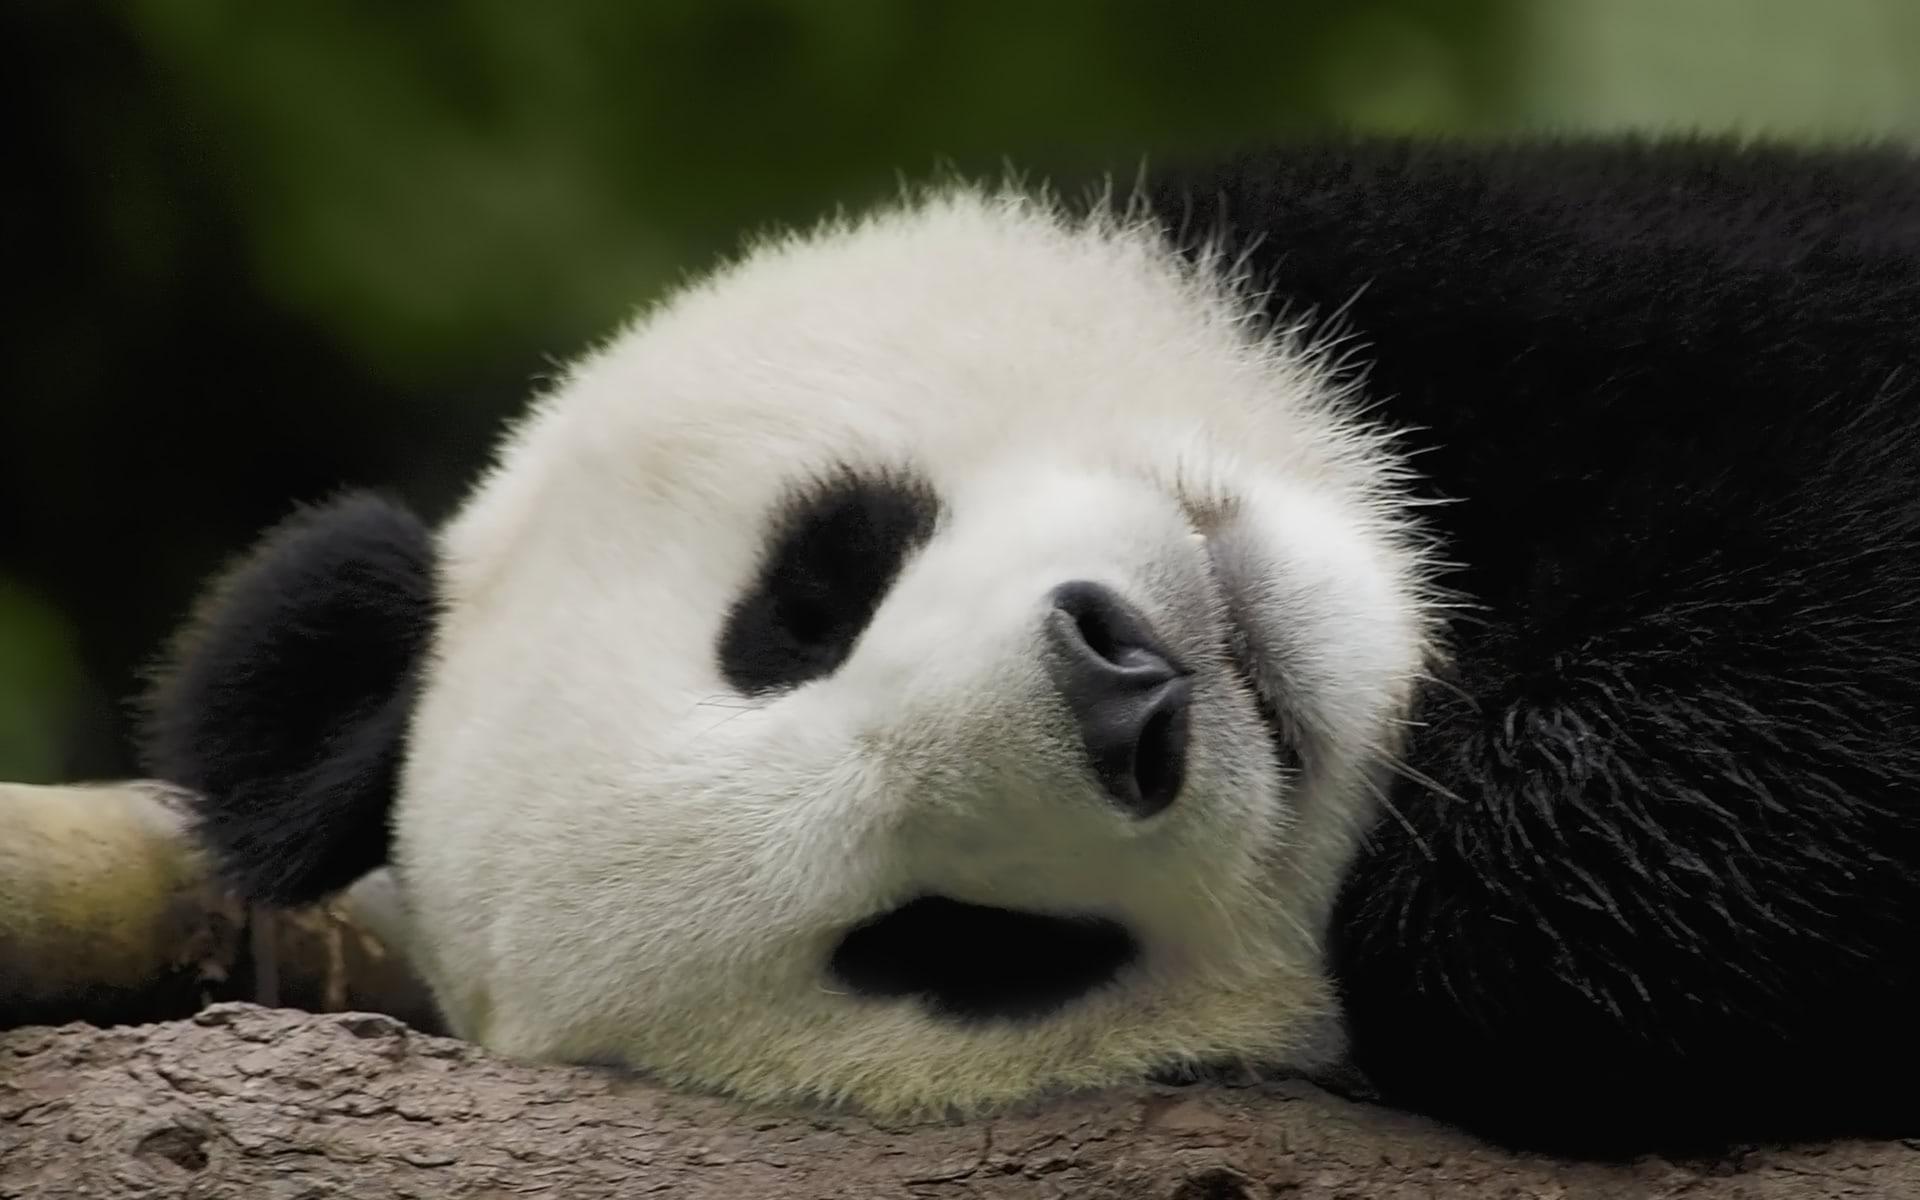 Panda Hd Wallpapers 7wallpapersnet